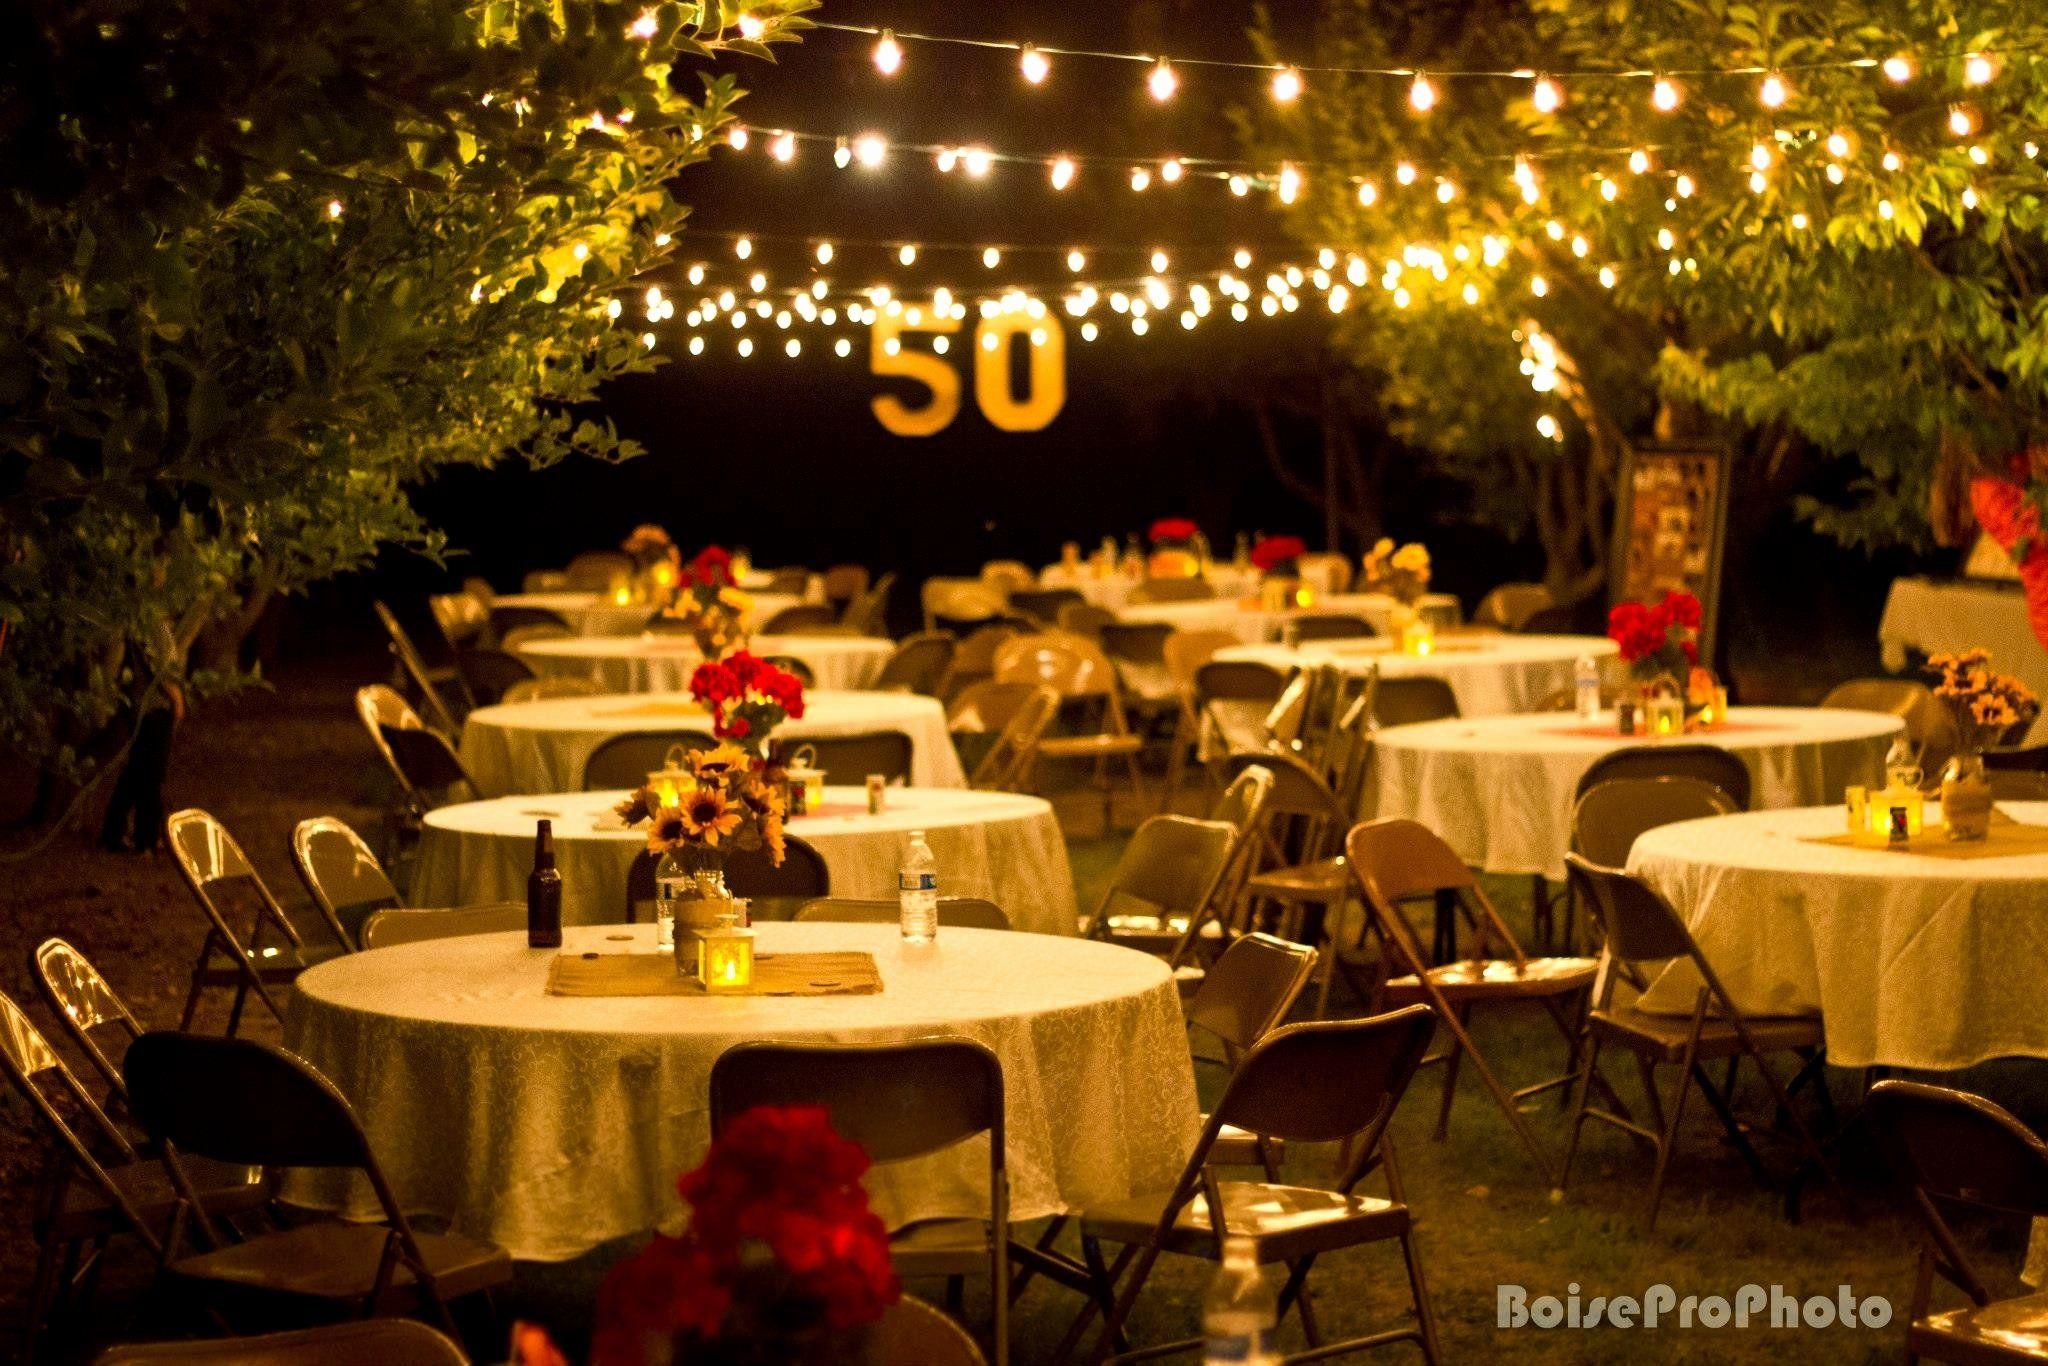 10 Attractive 50Th Wedding Anniversary Decoration Ideas 50th wedding anniversary decoration ideas new wedding anniversary 2020